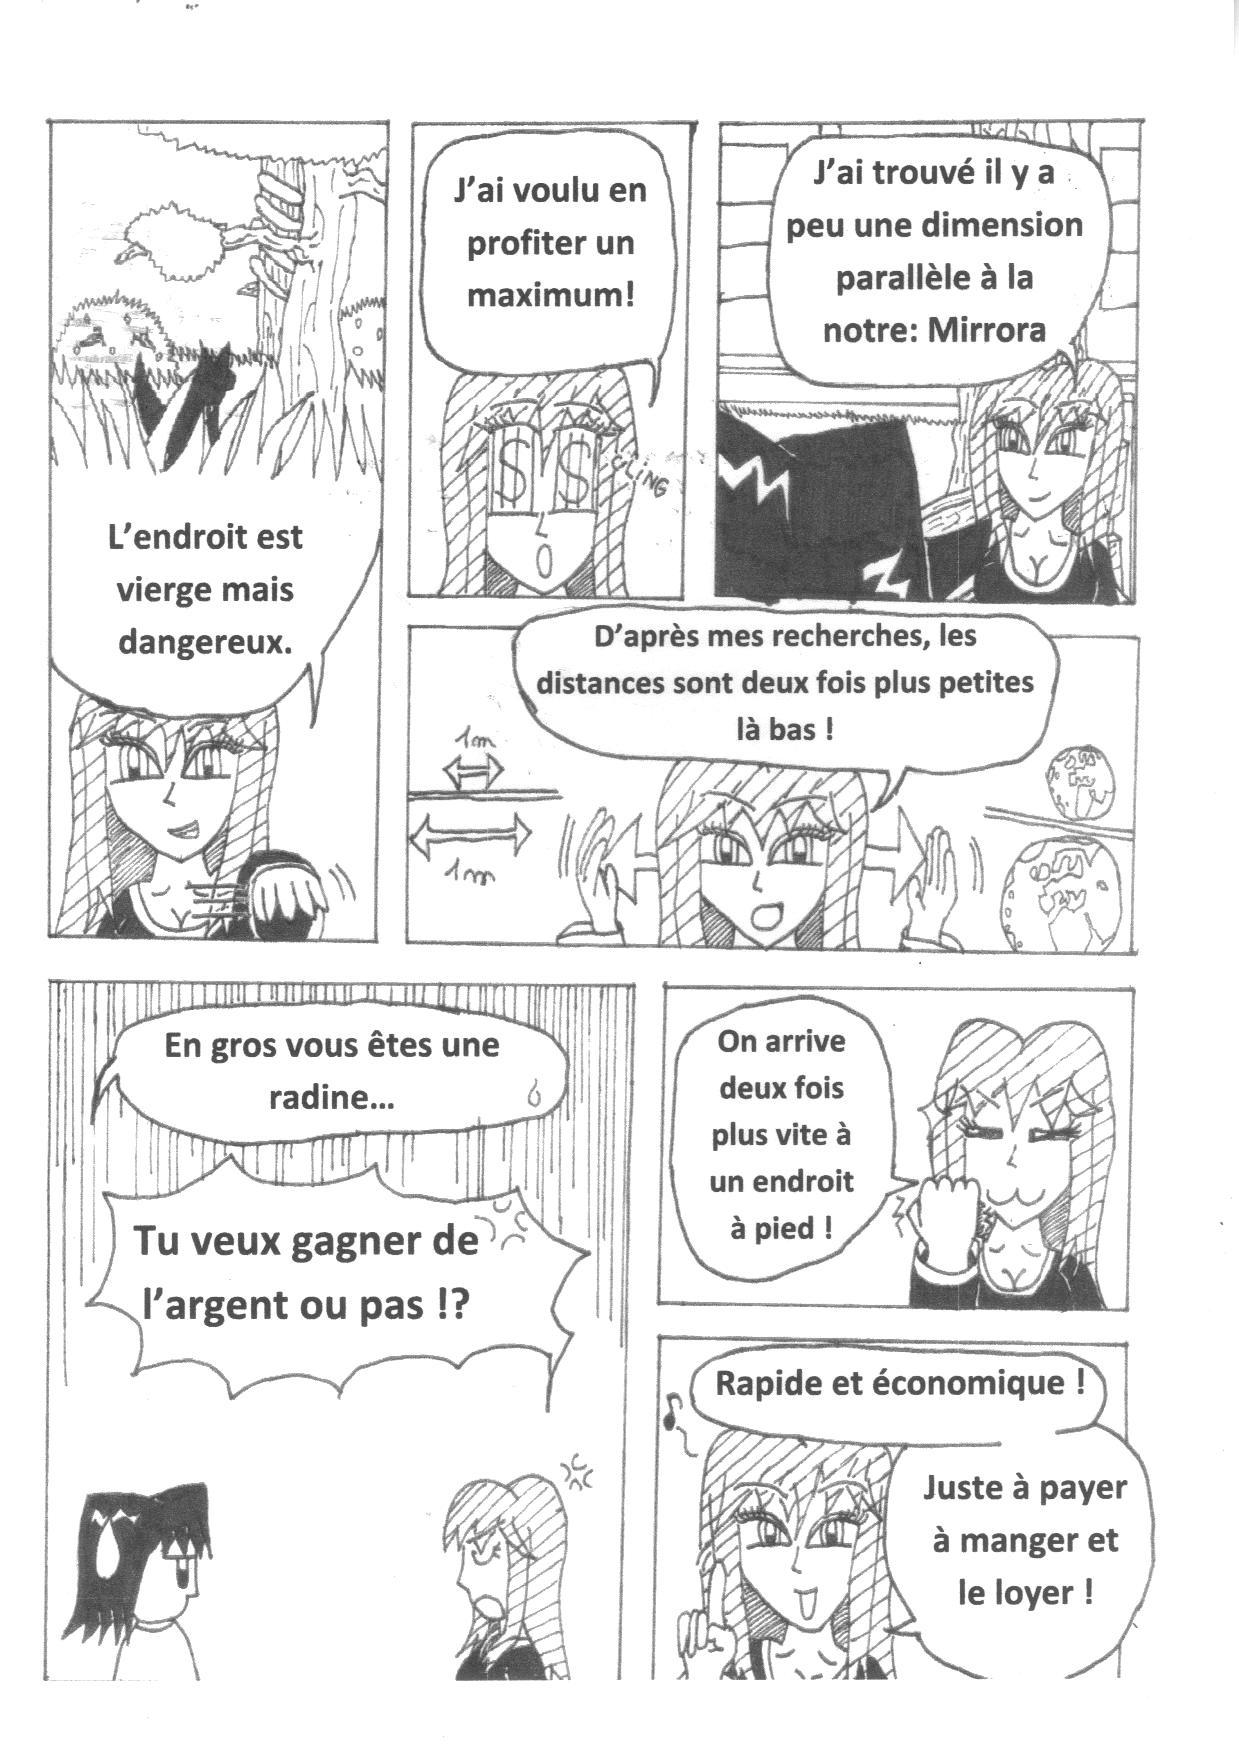 Mirrora: Une nouvelle histoire qui commence! 271822Mirrora13